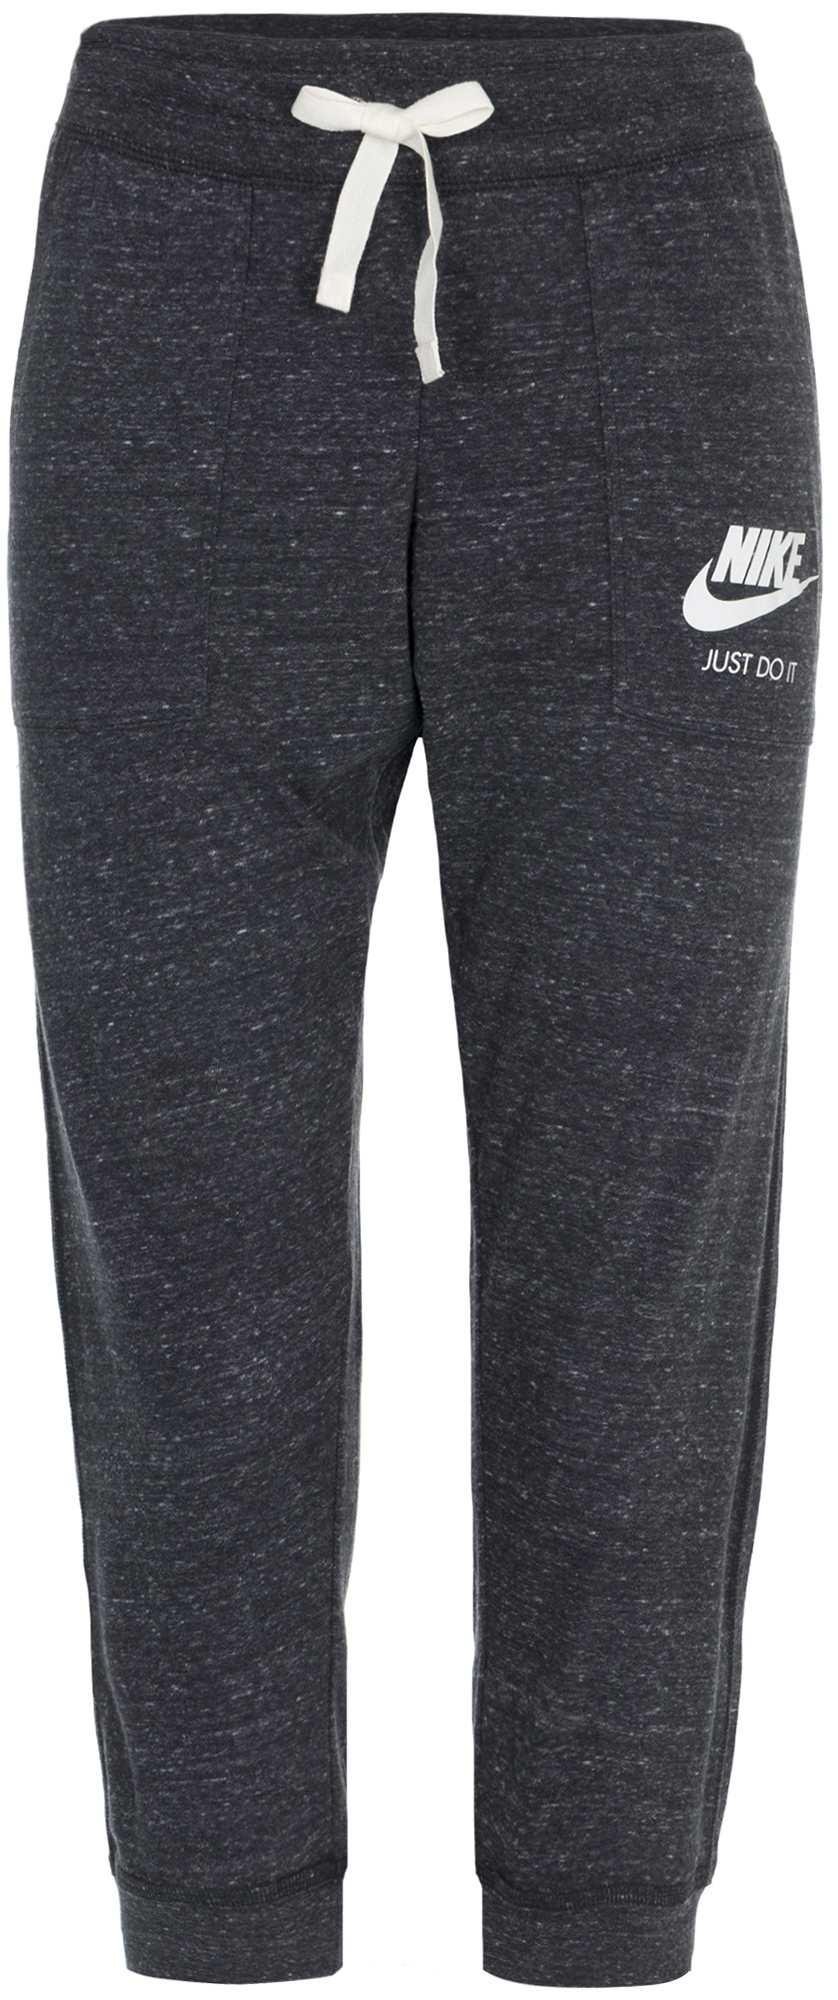 Nike Бриджи женские Nike Sportswear Vintage, размер 48-50